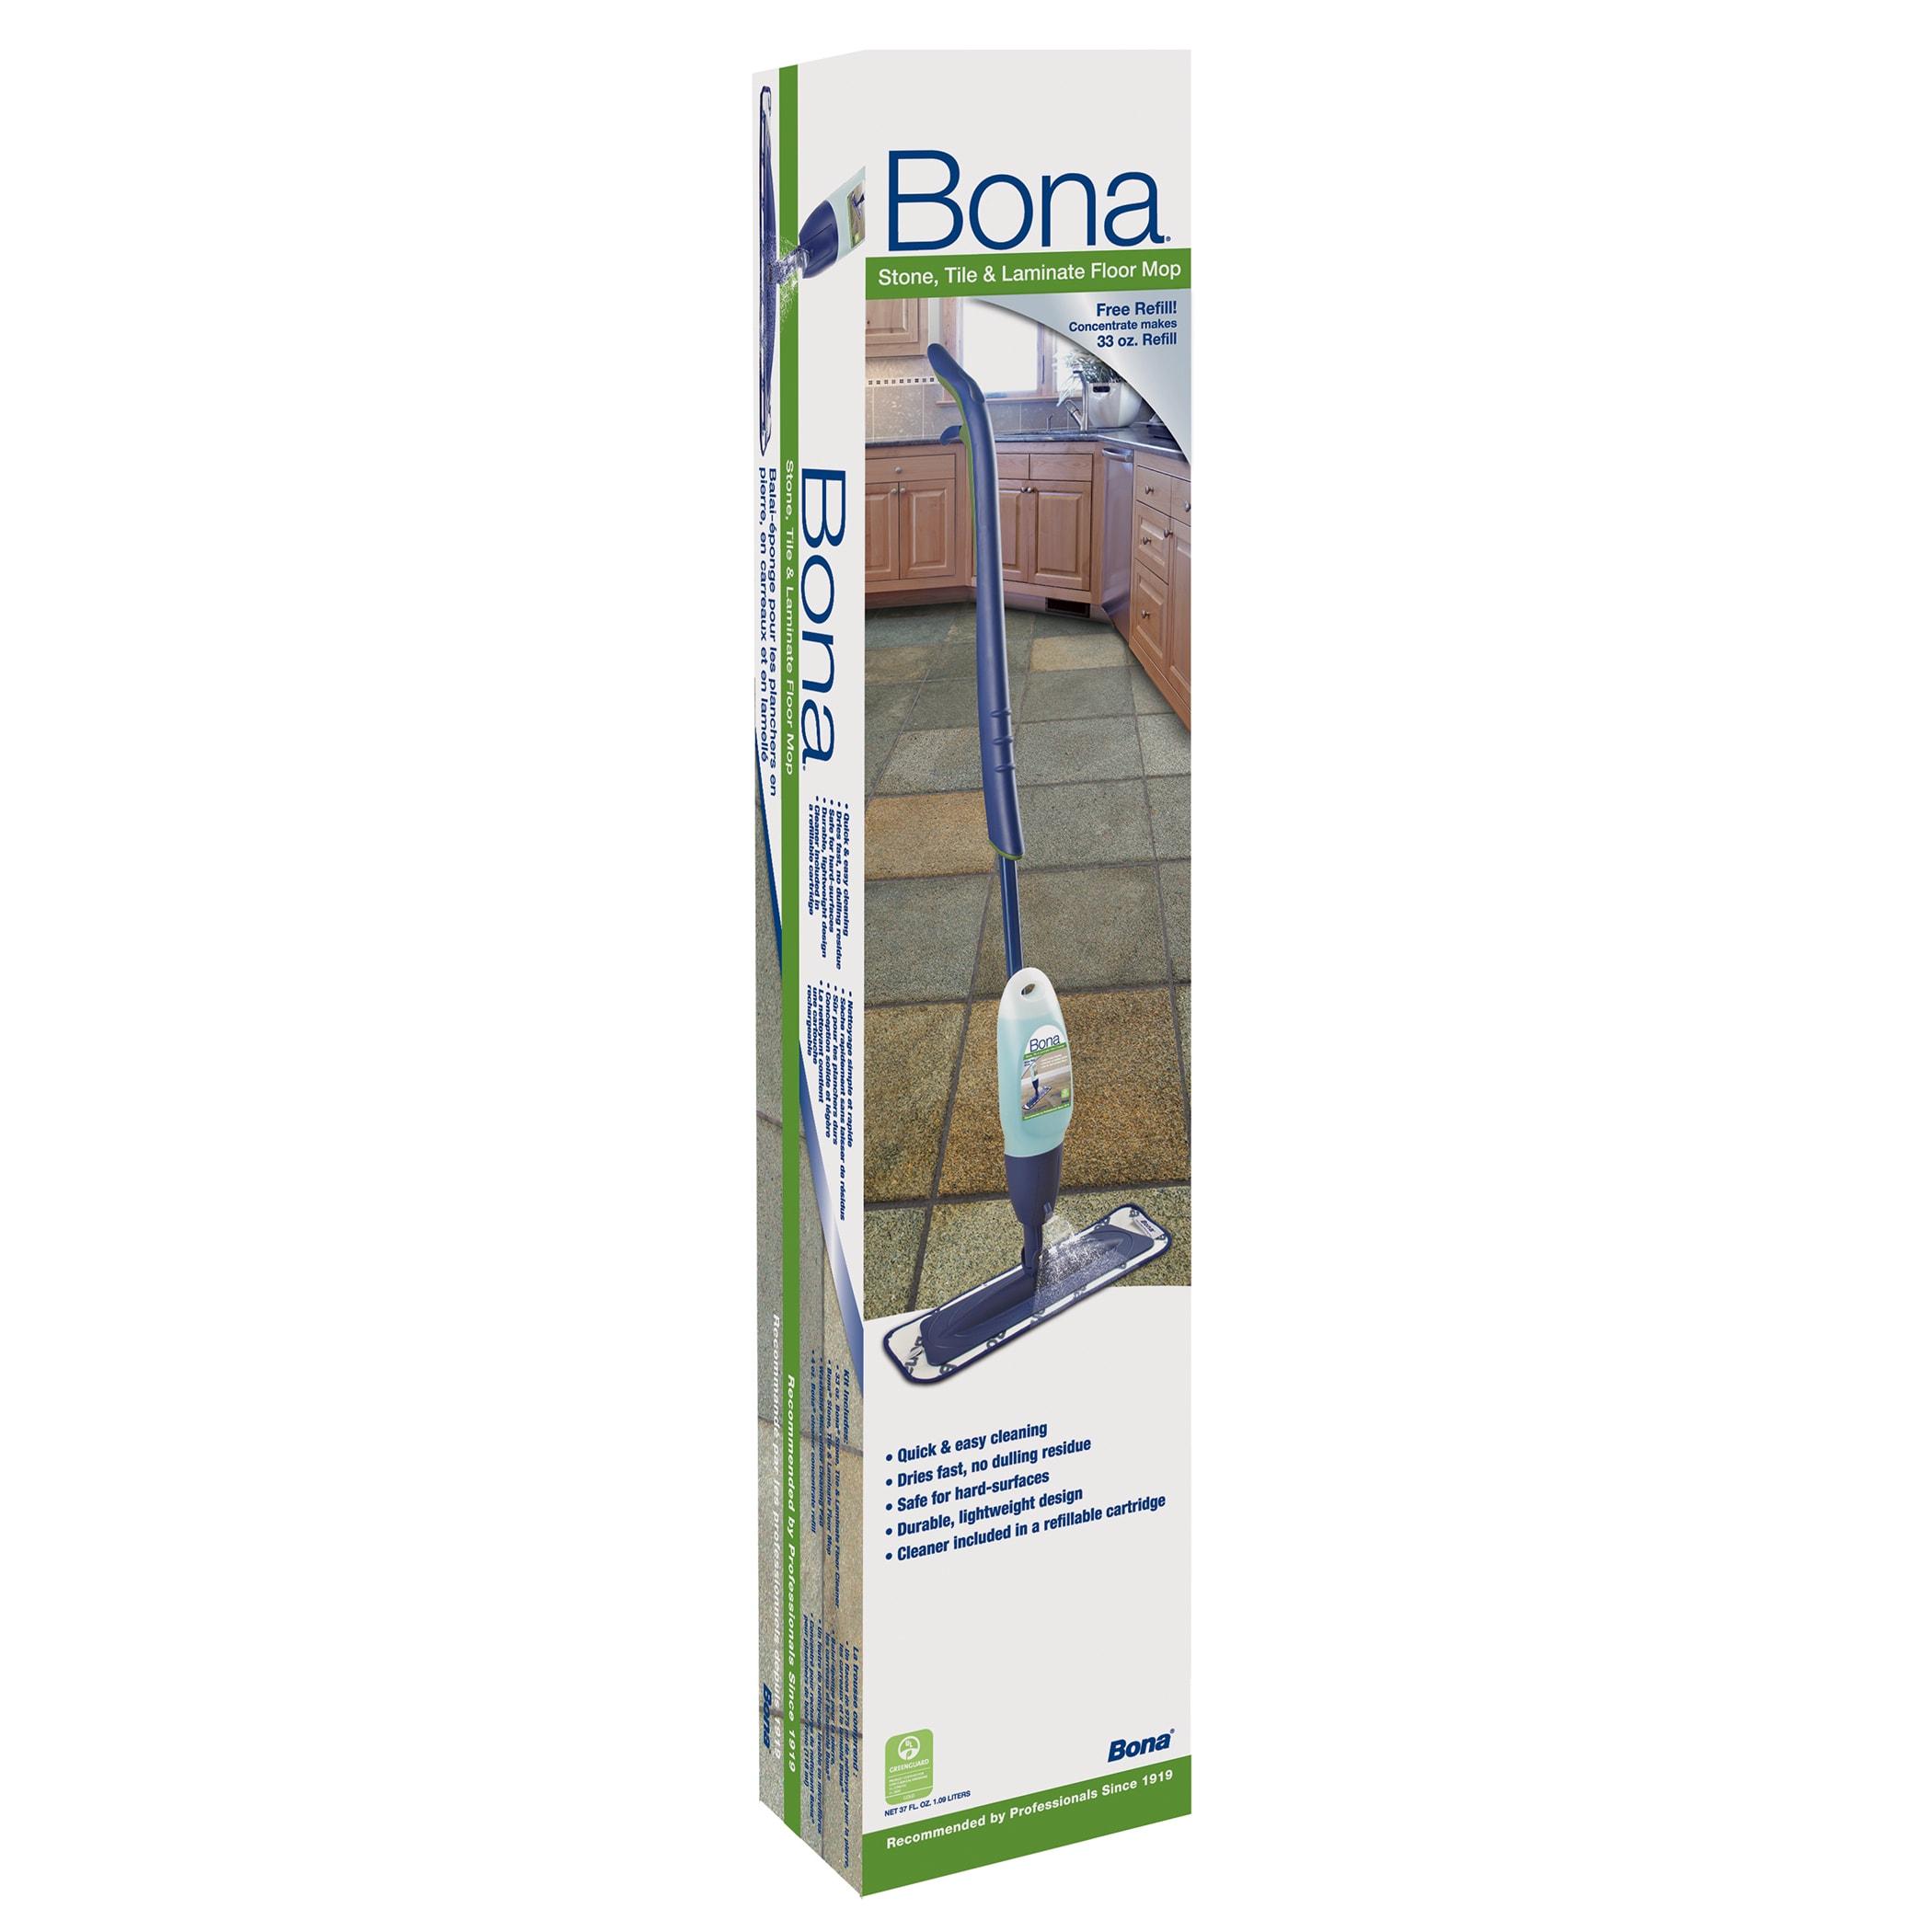 Bona Wm710013385 Stone Tile Floor Care Kit Free Shipping On